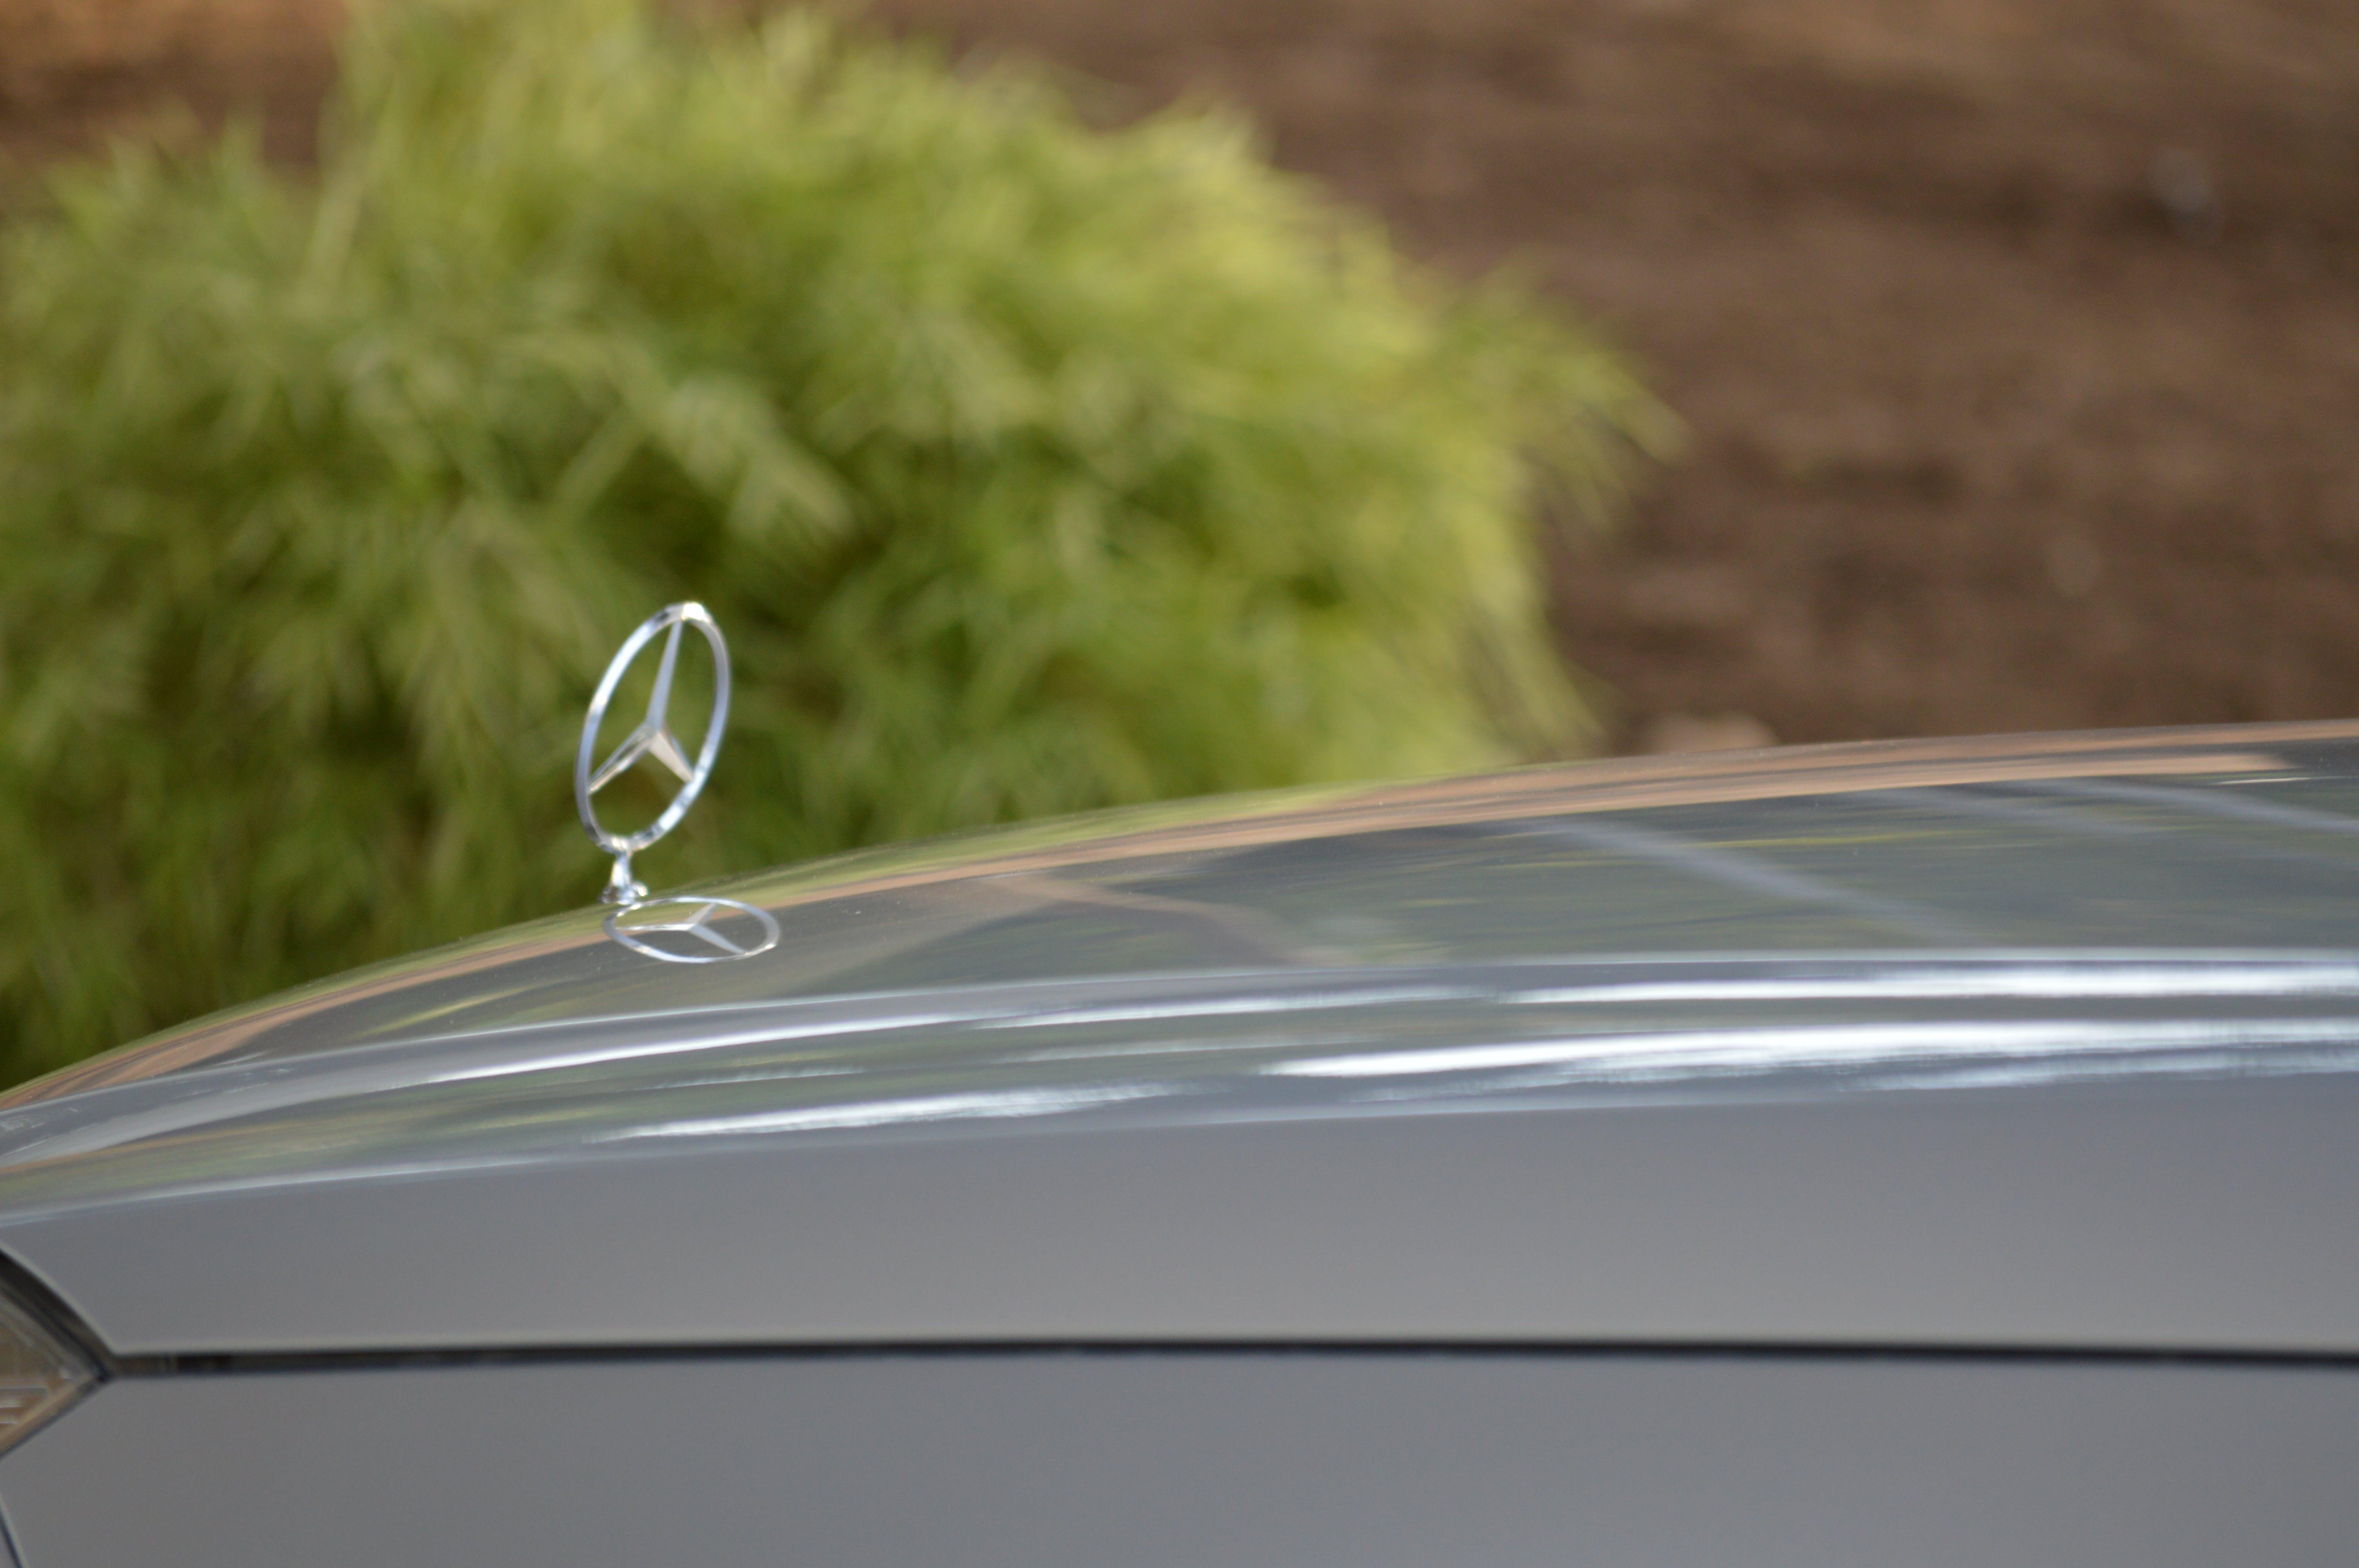 Gratis arkivbilde med biler, foto, Kenya, luksusbil